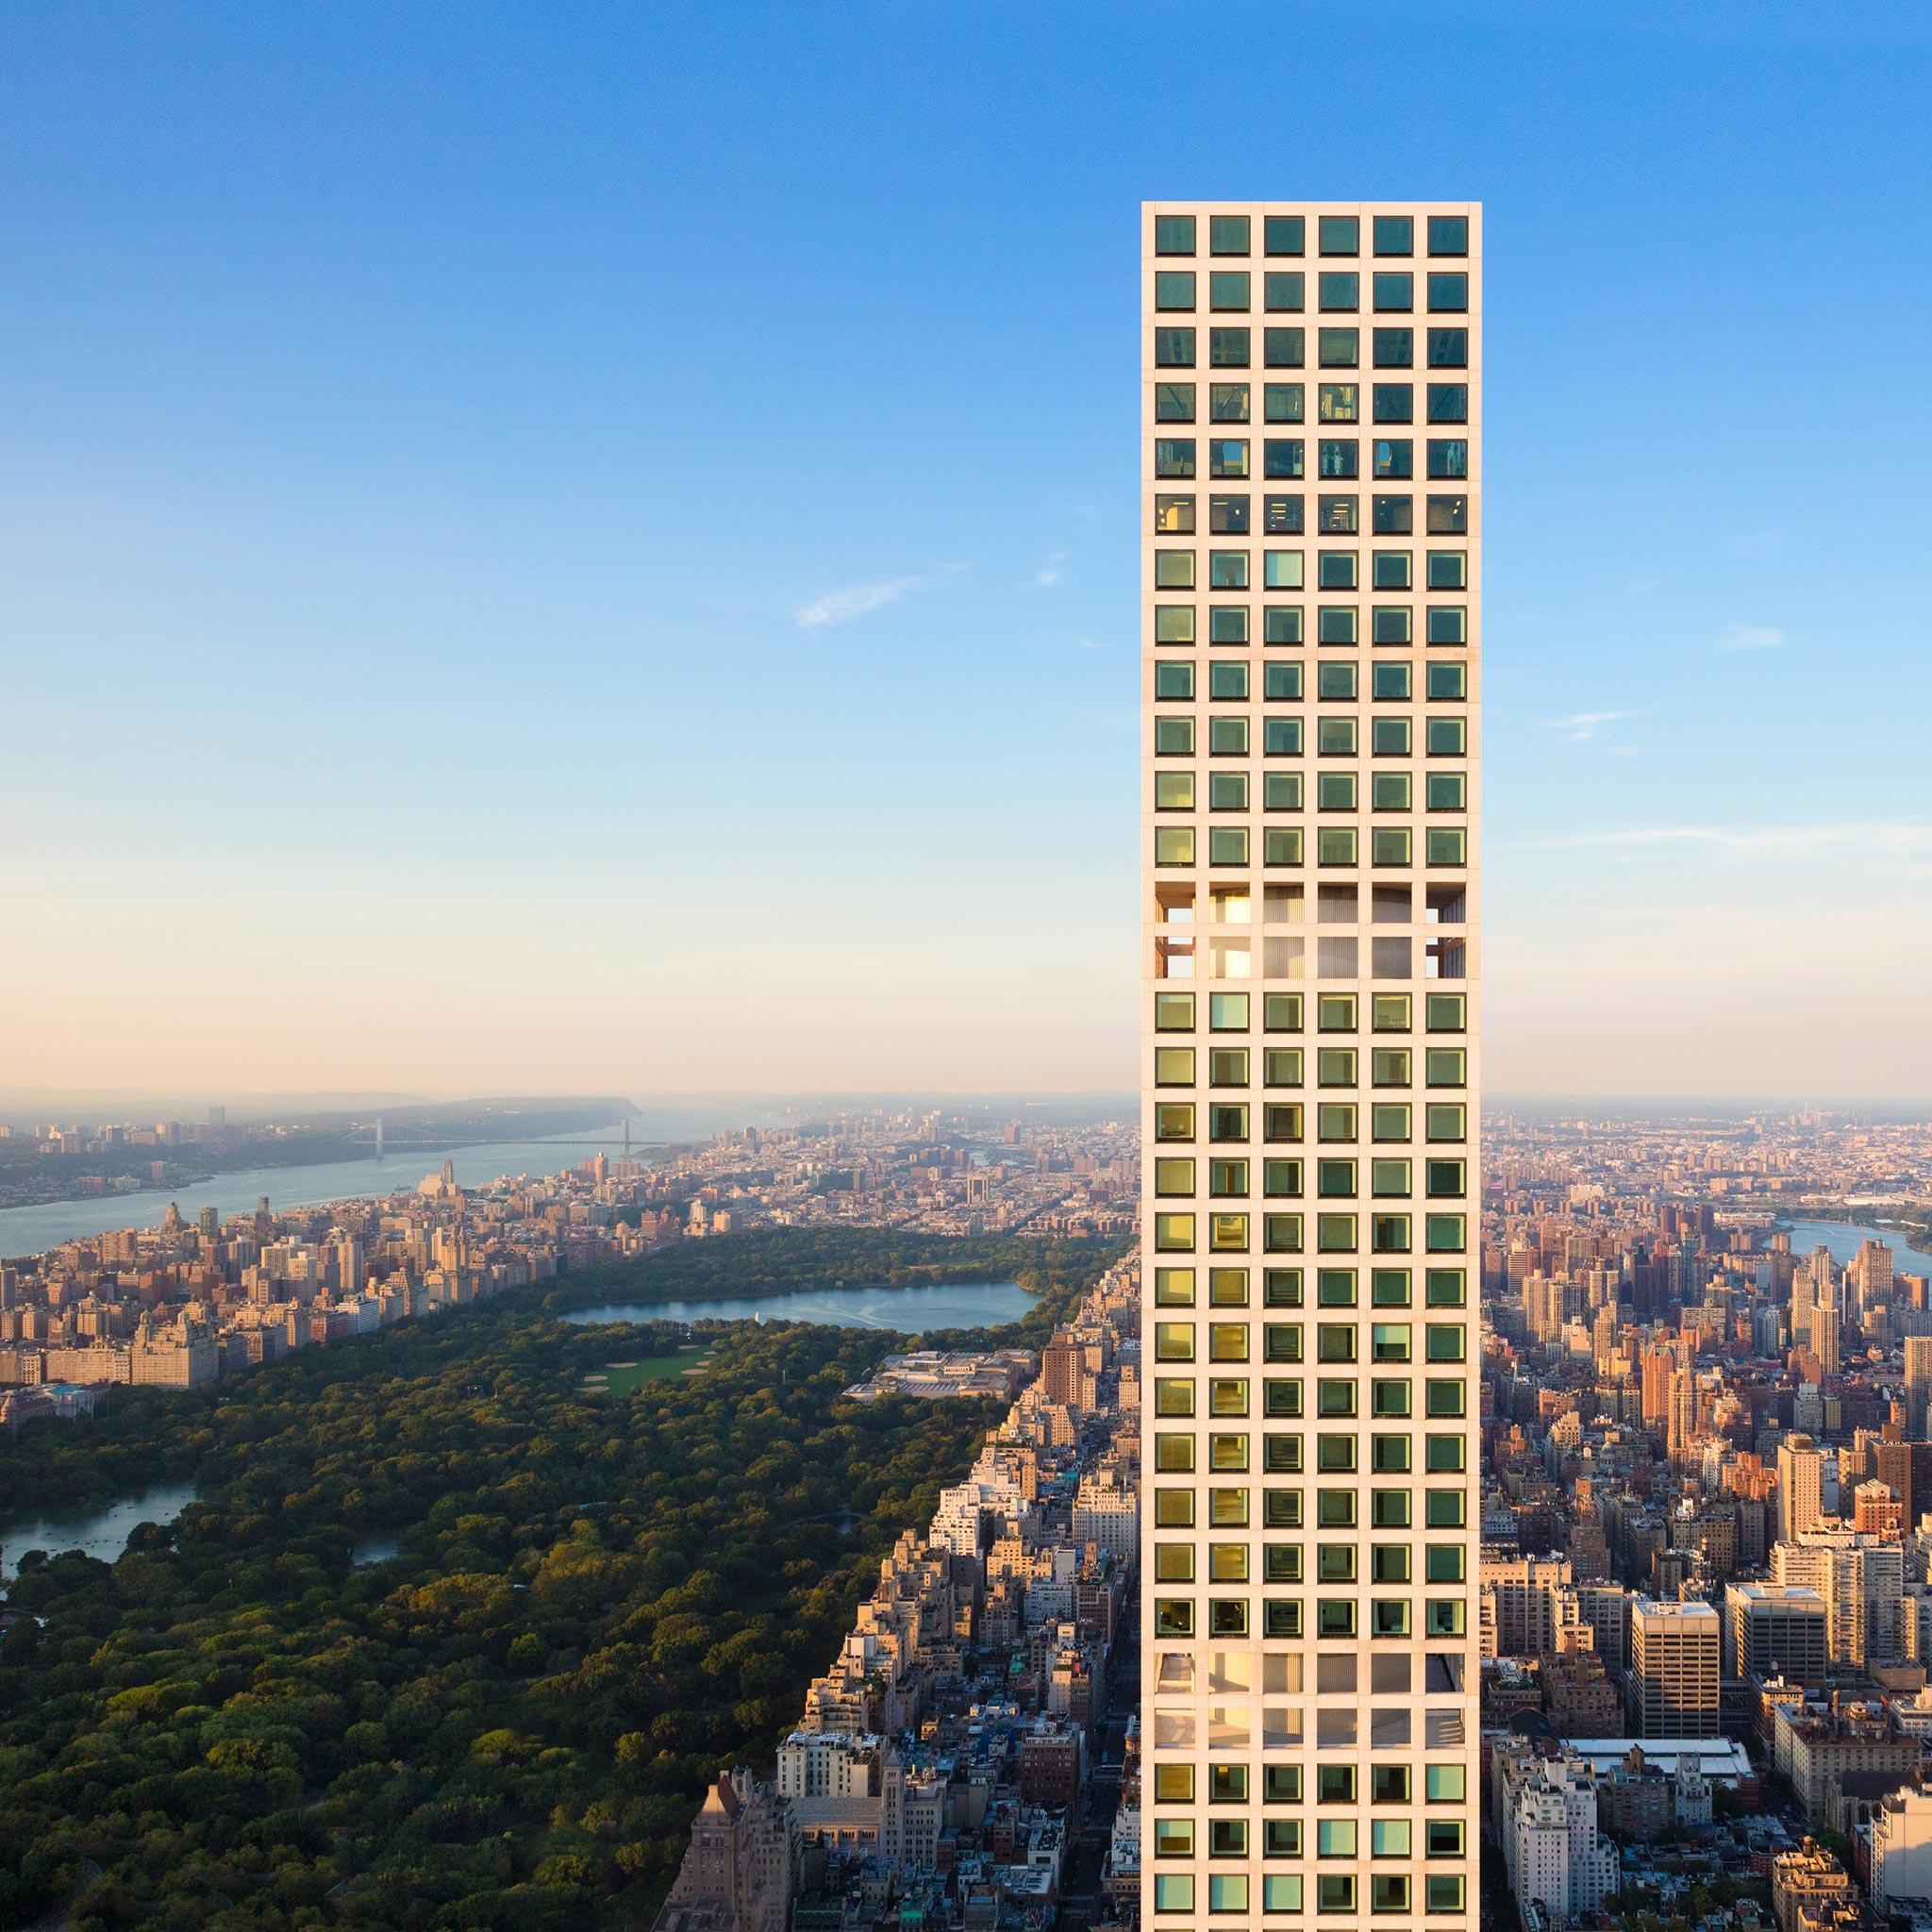 2 - 432 Park AvenueDeveloper: Macklowe Properties, CIM GroupAverage ppsf: $5,542Number of sales: 21